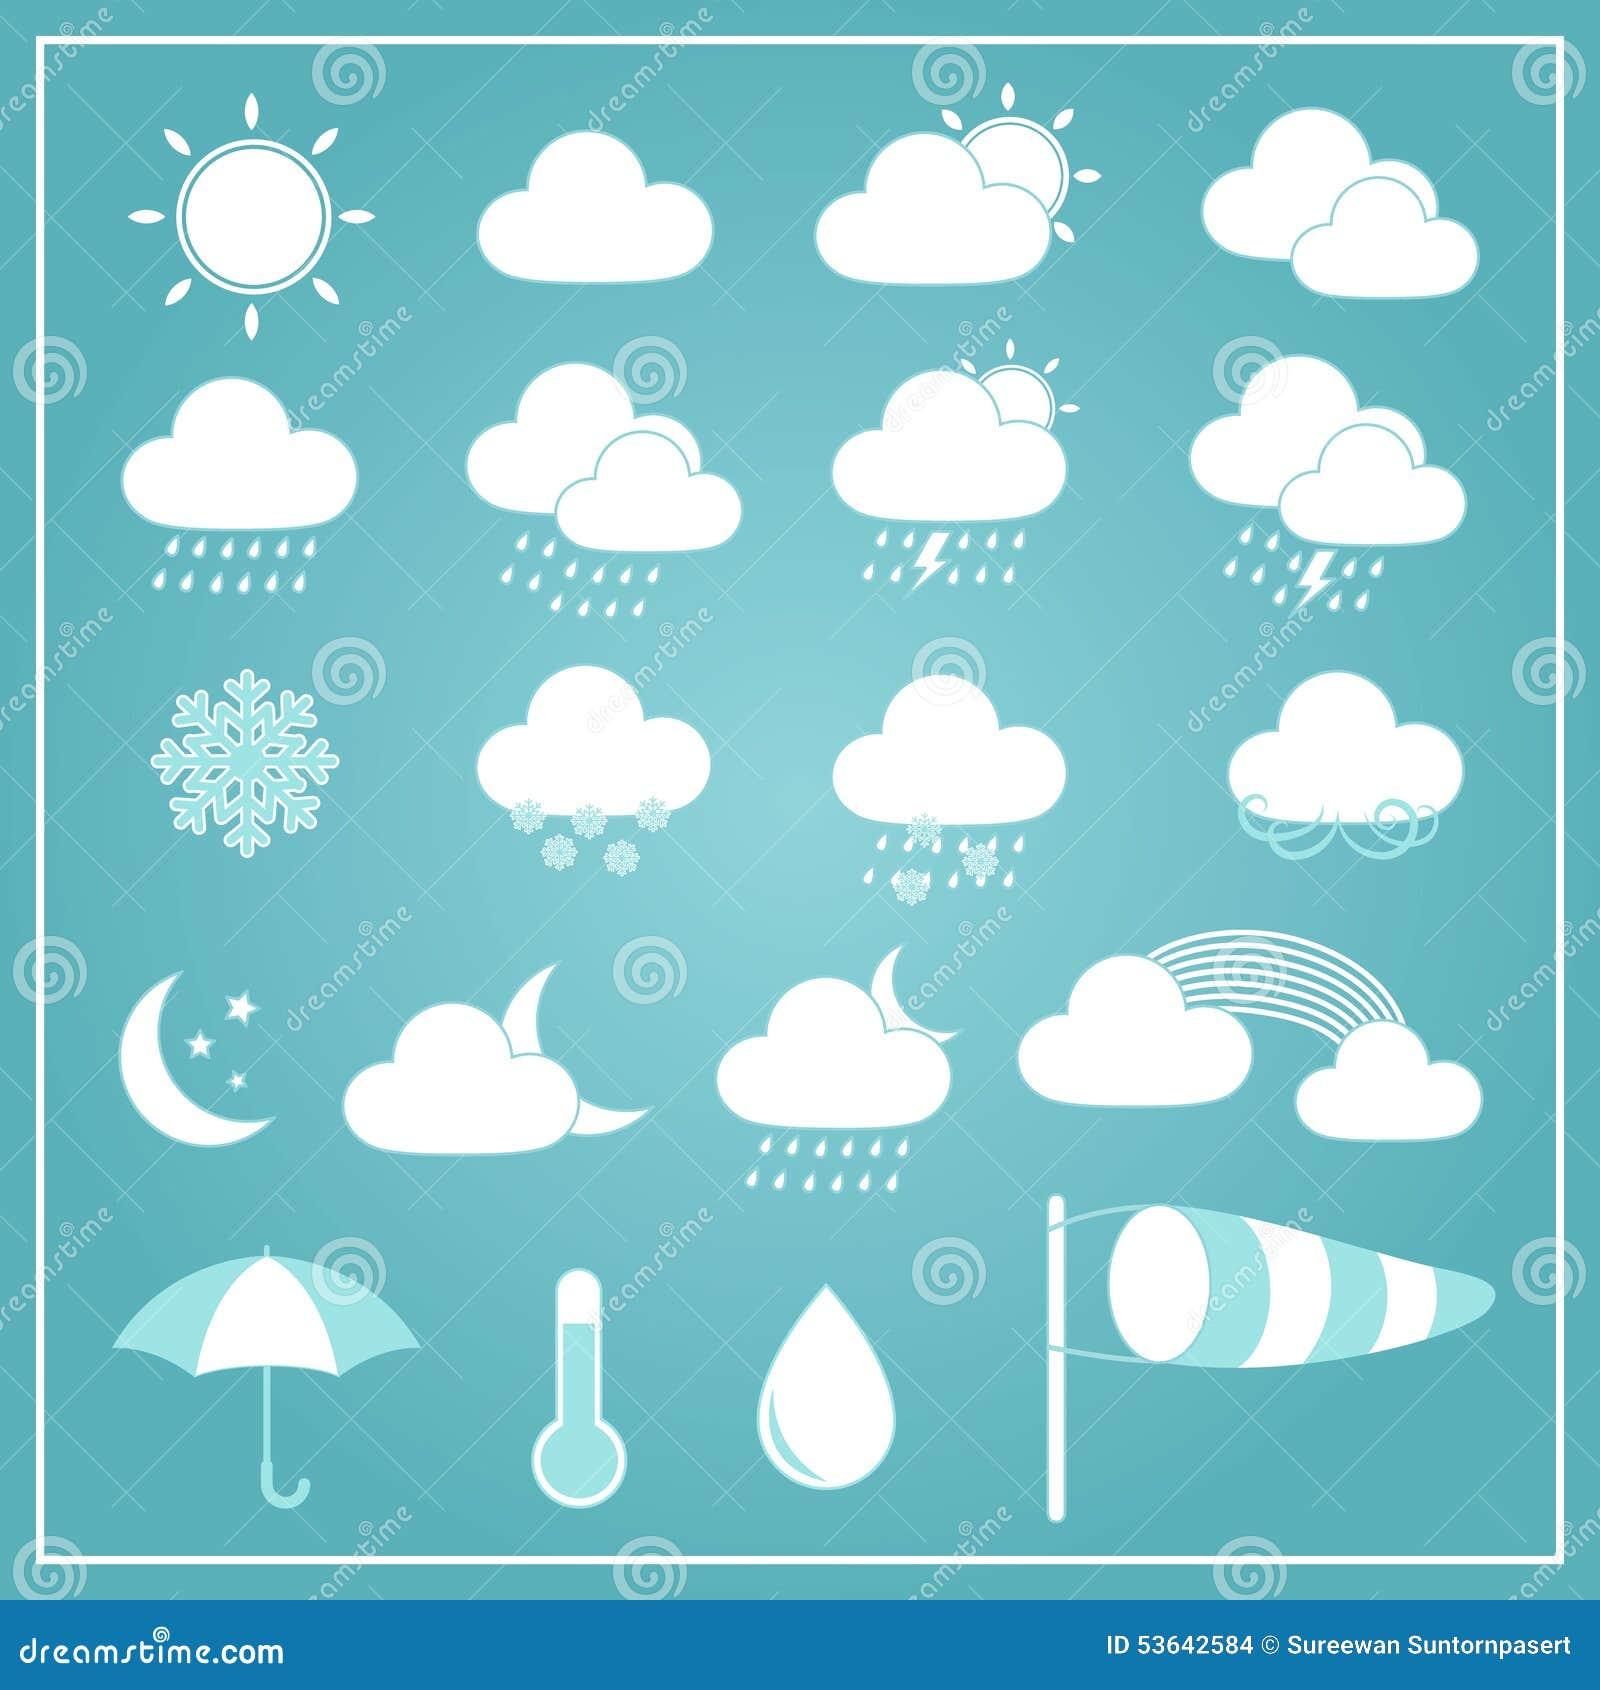 Basic weather icons on blue background stock vector illustration basic weather icons on blue background biocorpaavc Images